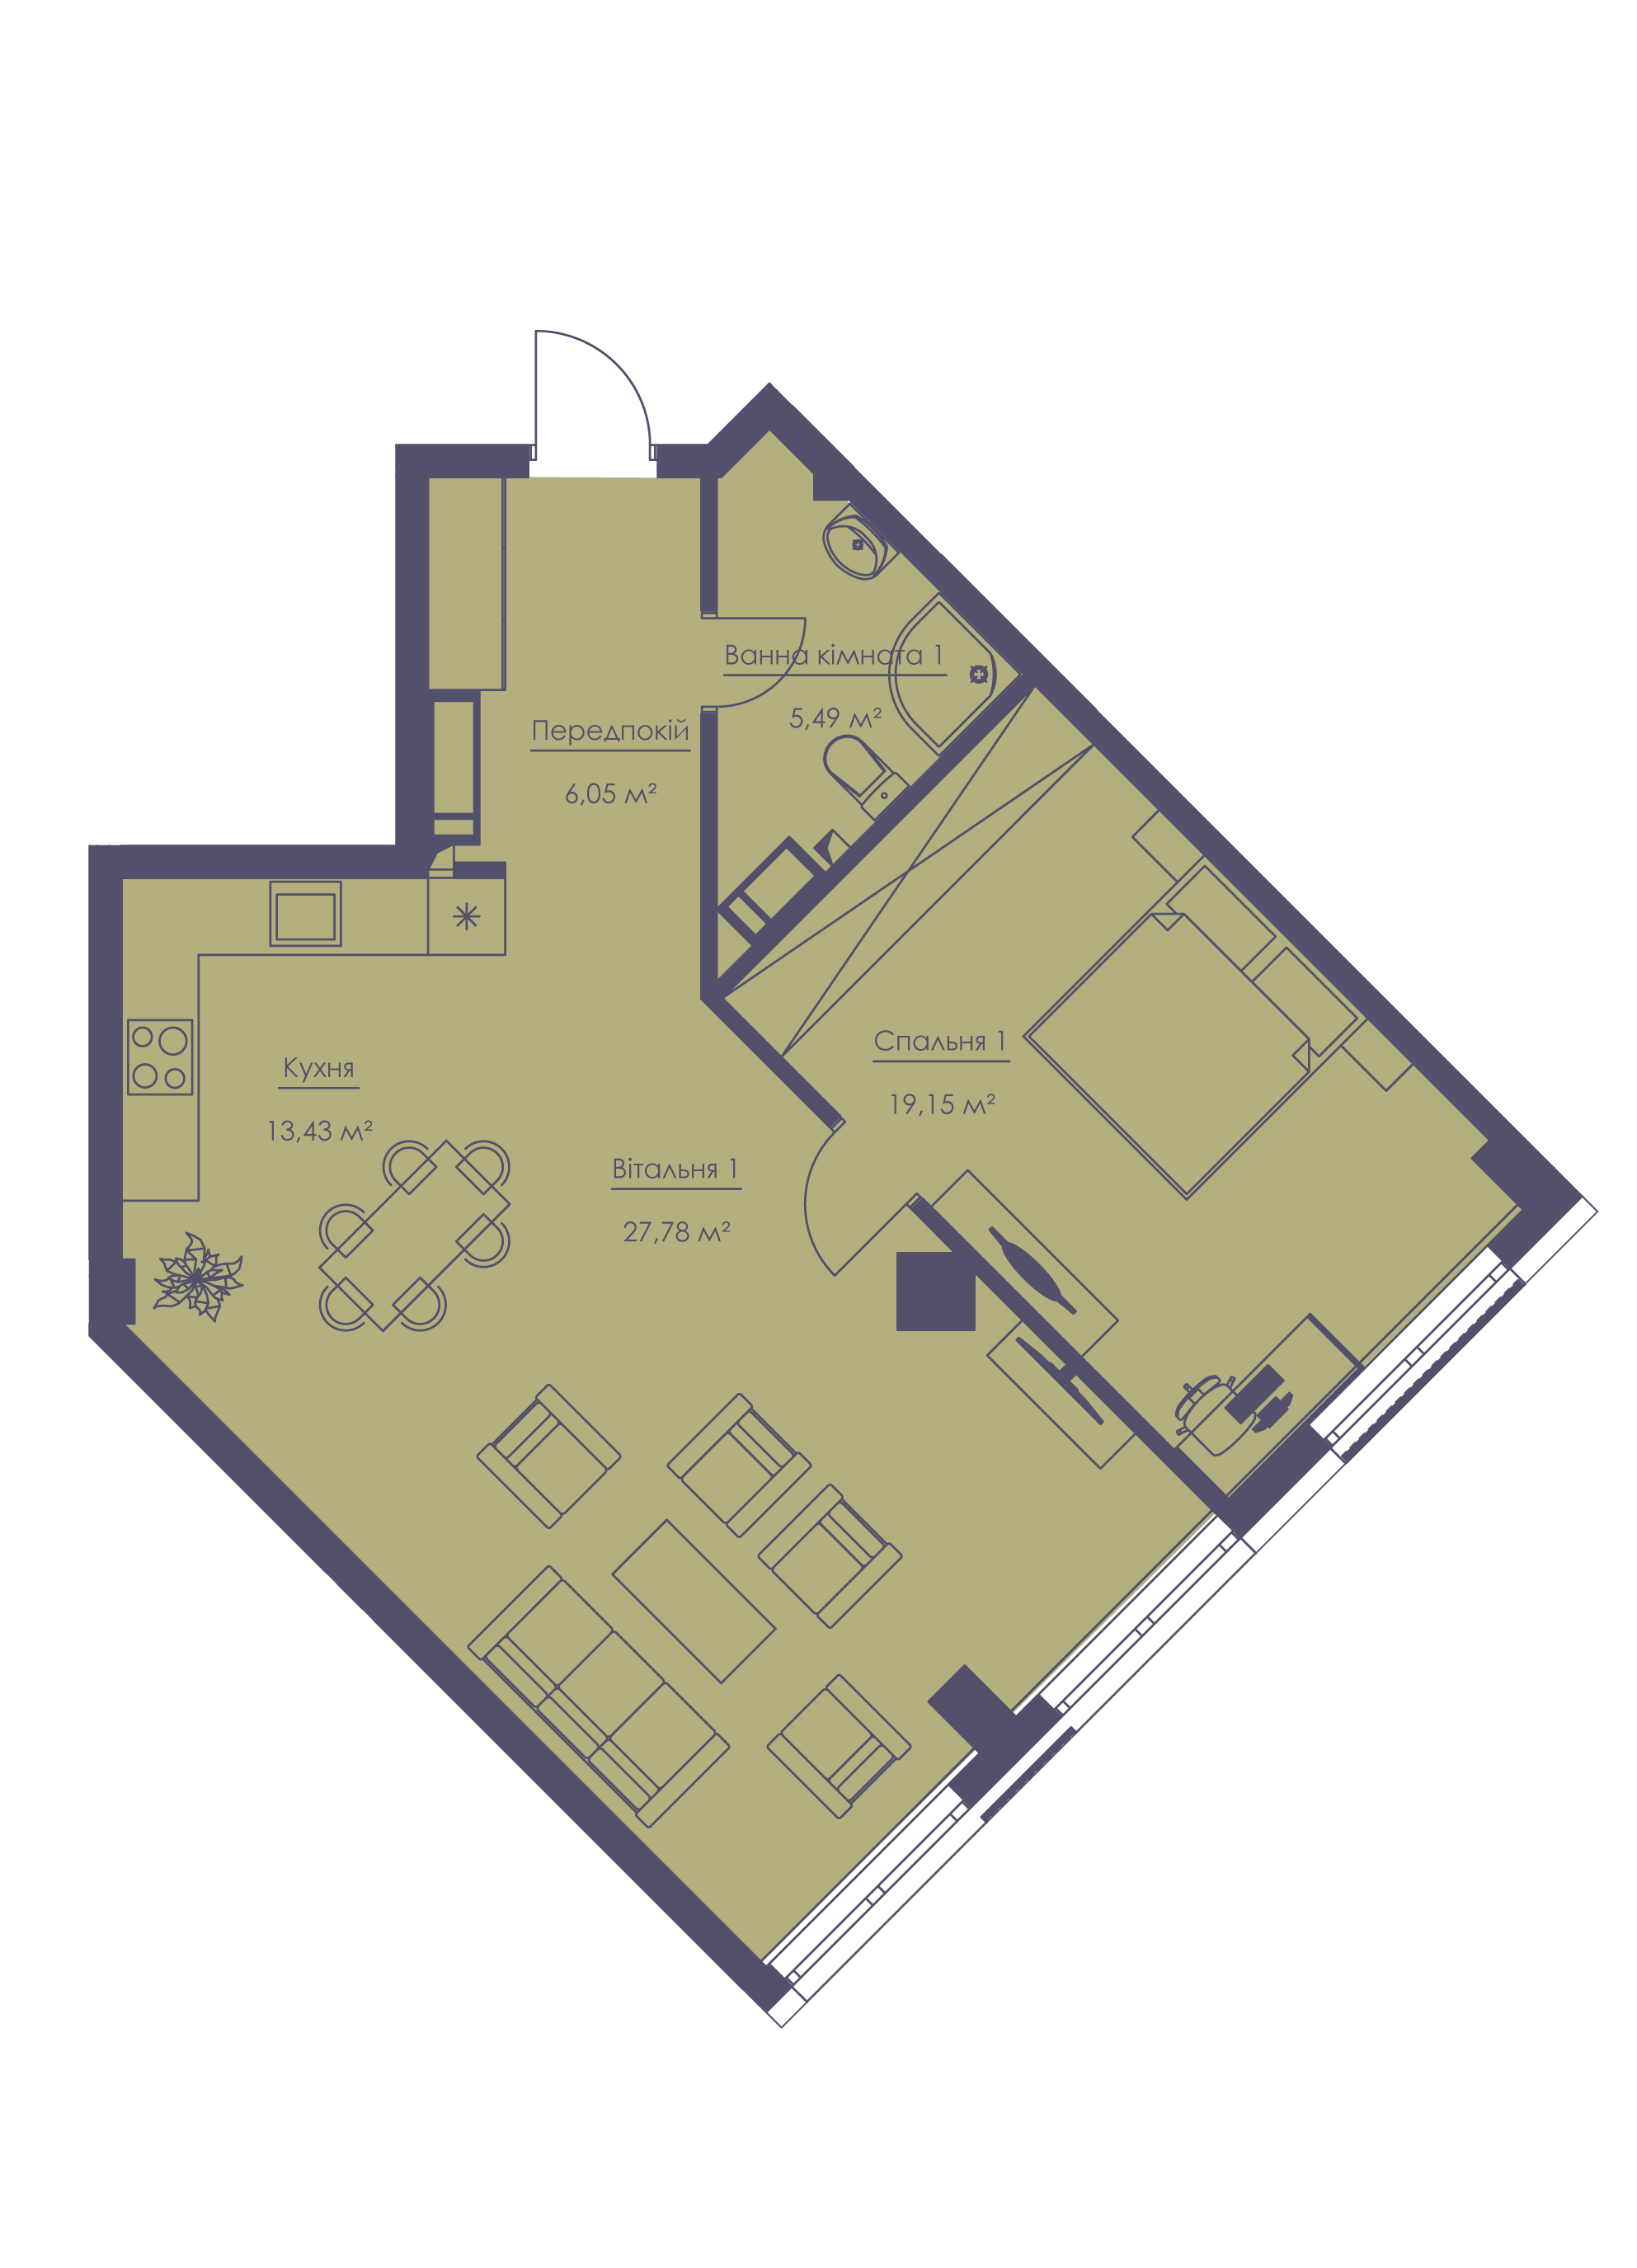 Apartment layout KV_80_2a_1_1_1-1